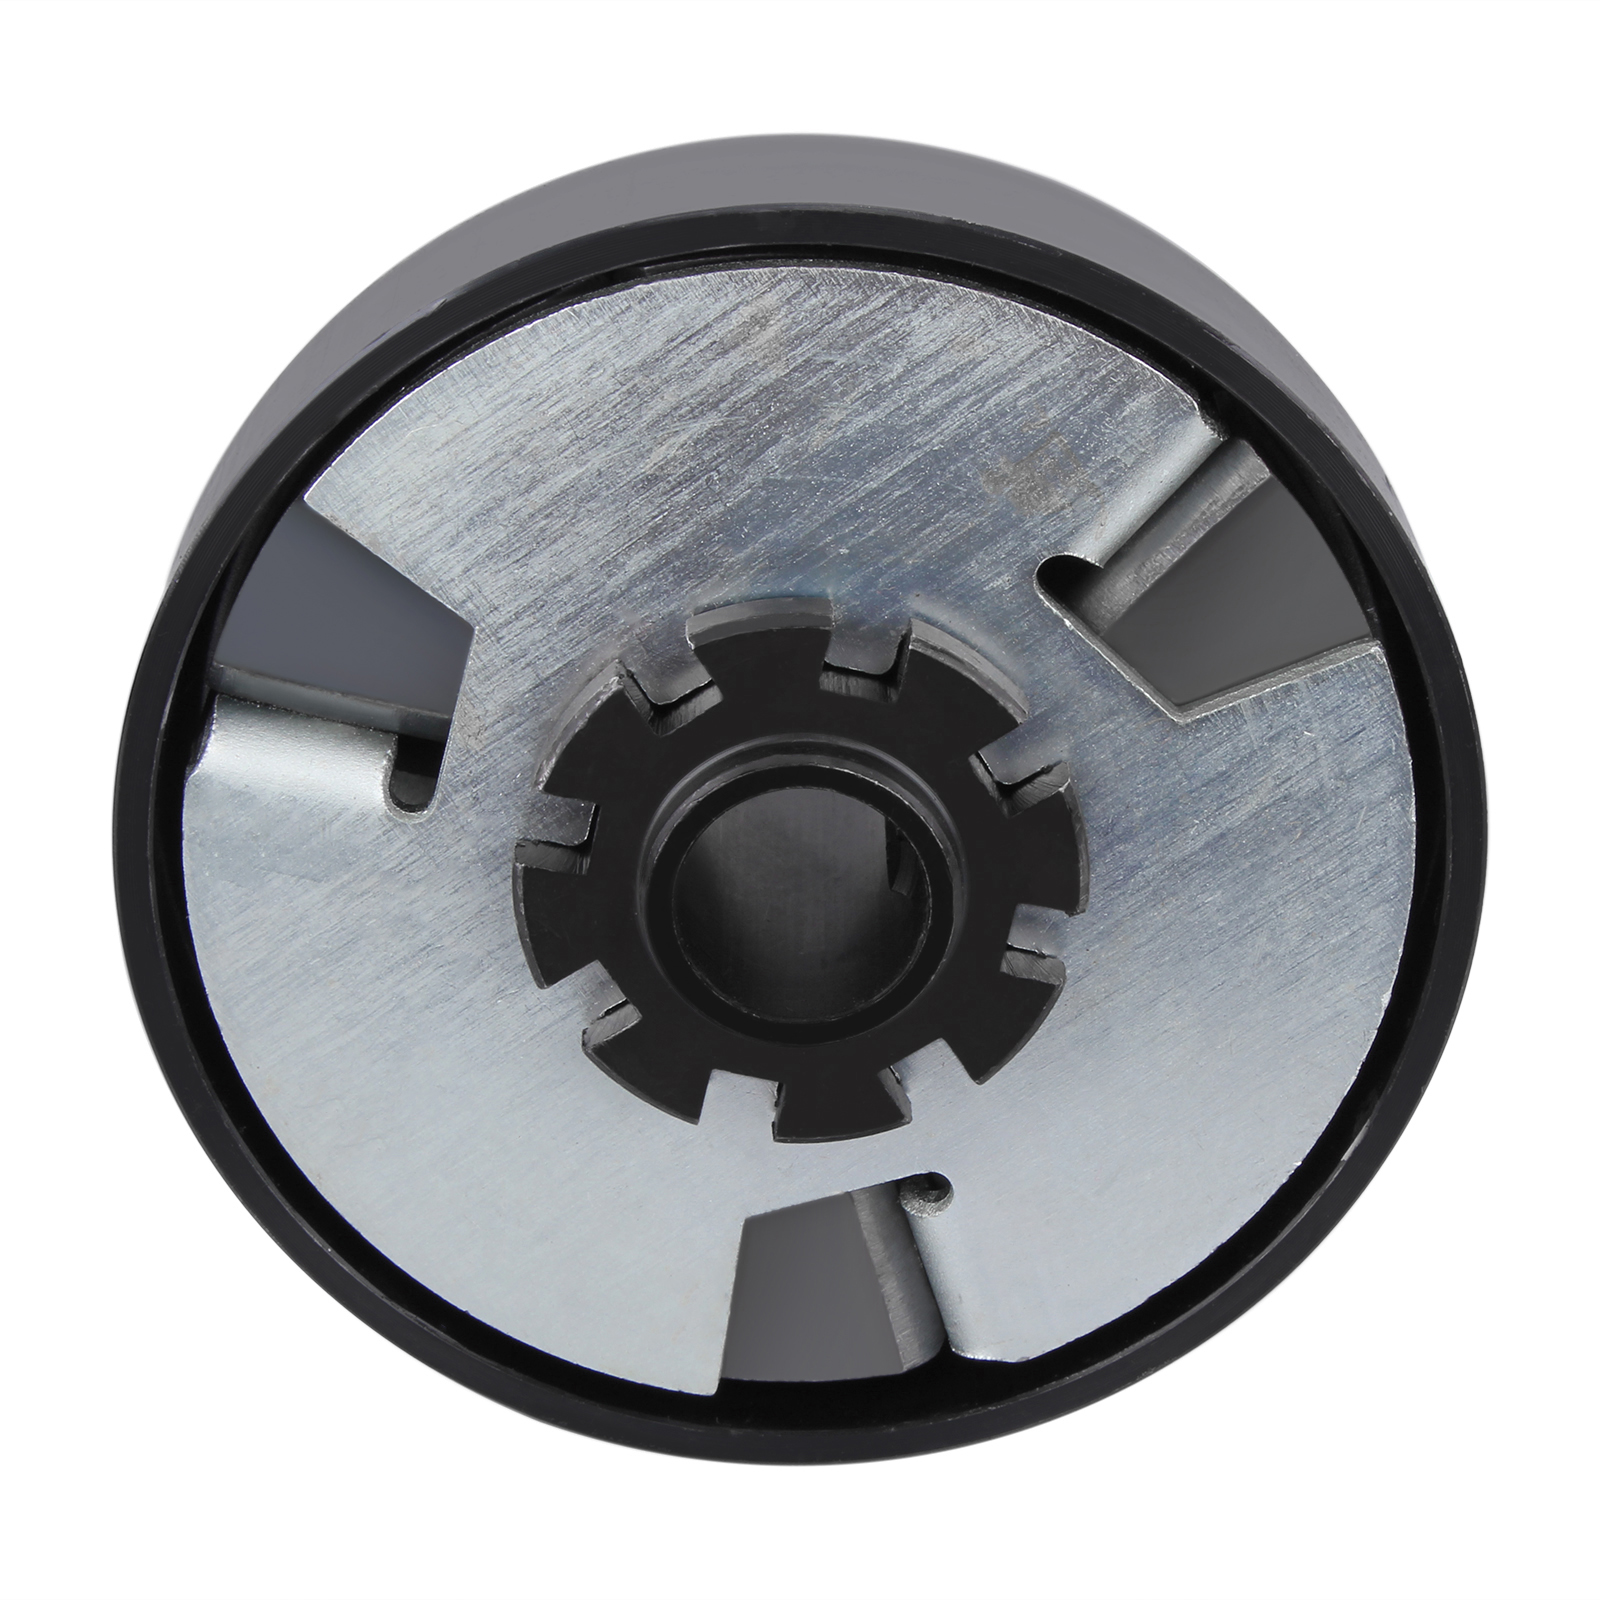 Steel SFI Flywheel - Olds V8 260-455 68-85 | eBay